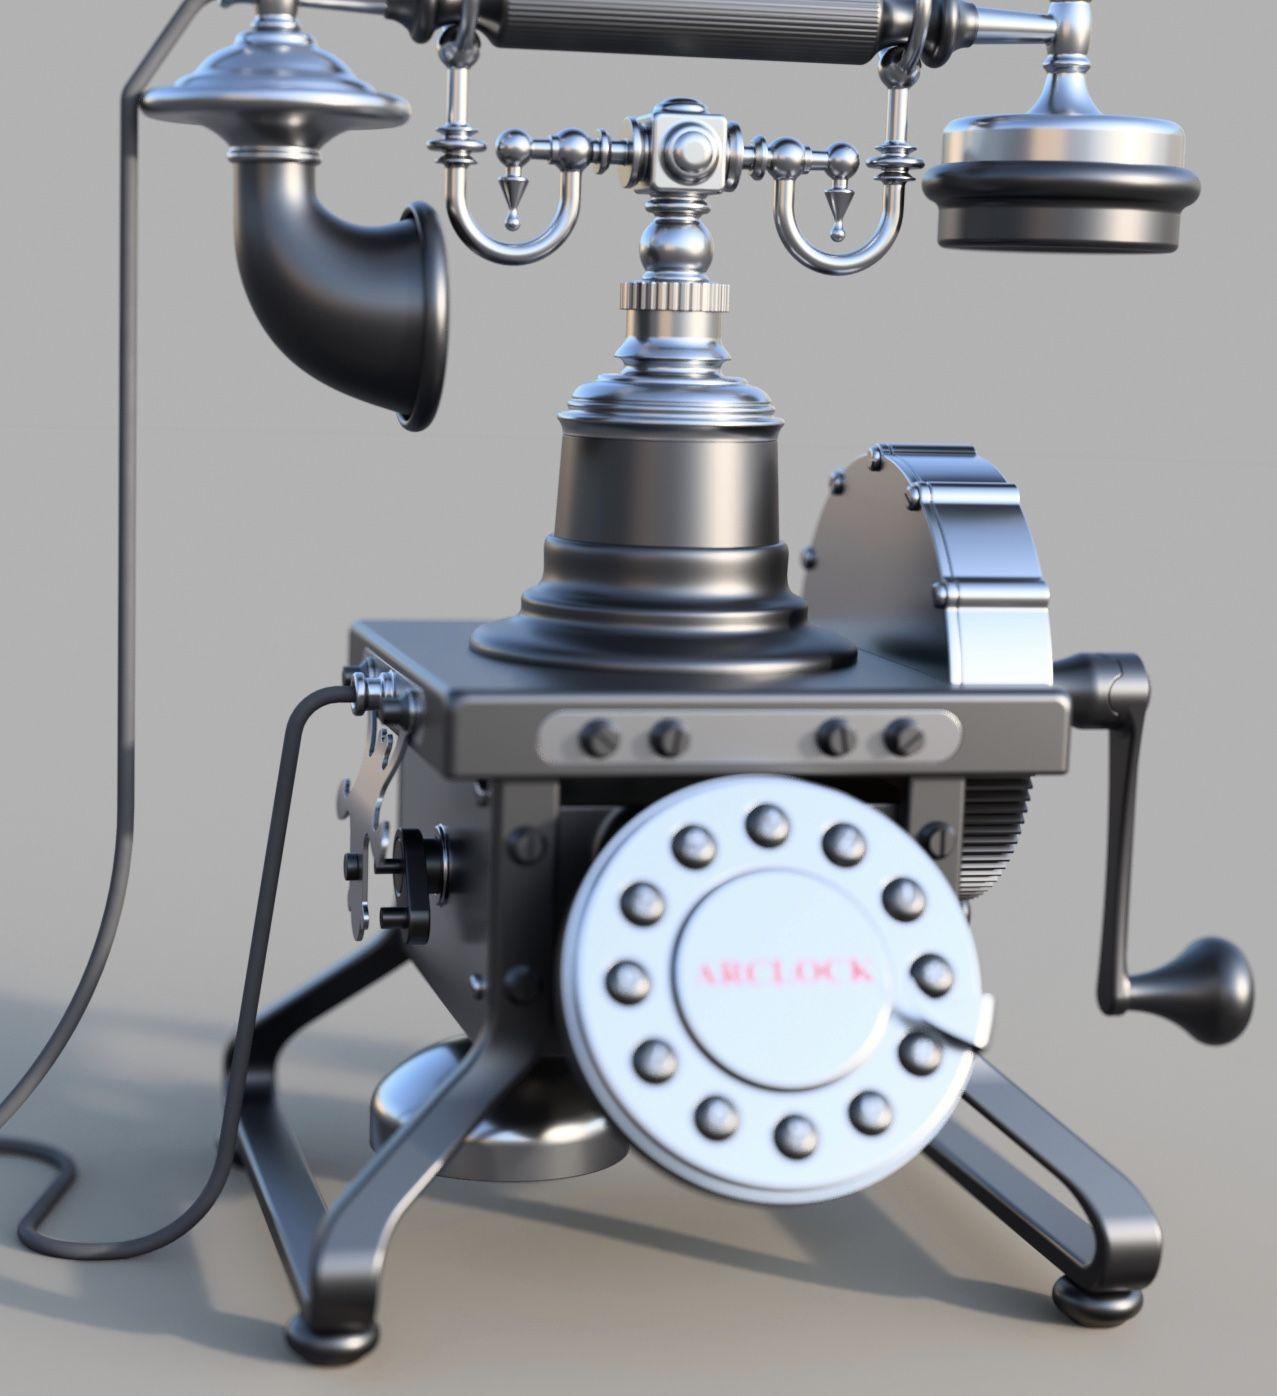 Arclock-phone-2017-jan-05-04-54-10am-000-customizedview33429057812-3500-3500